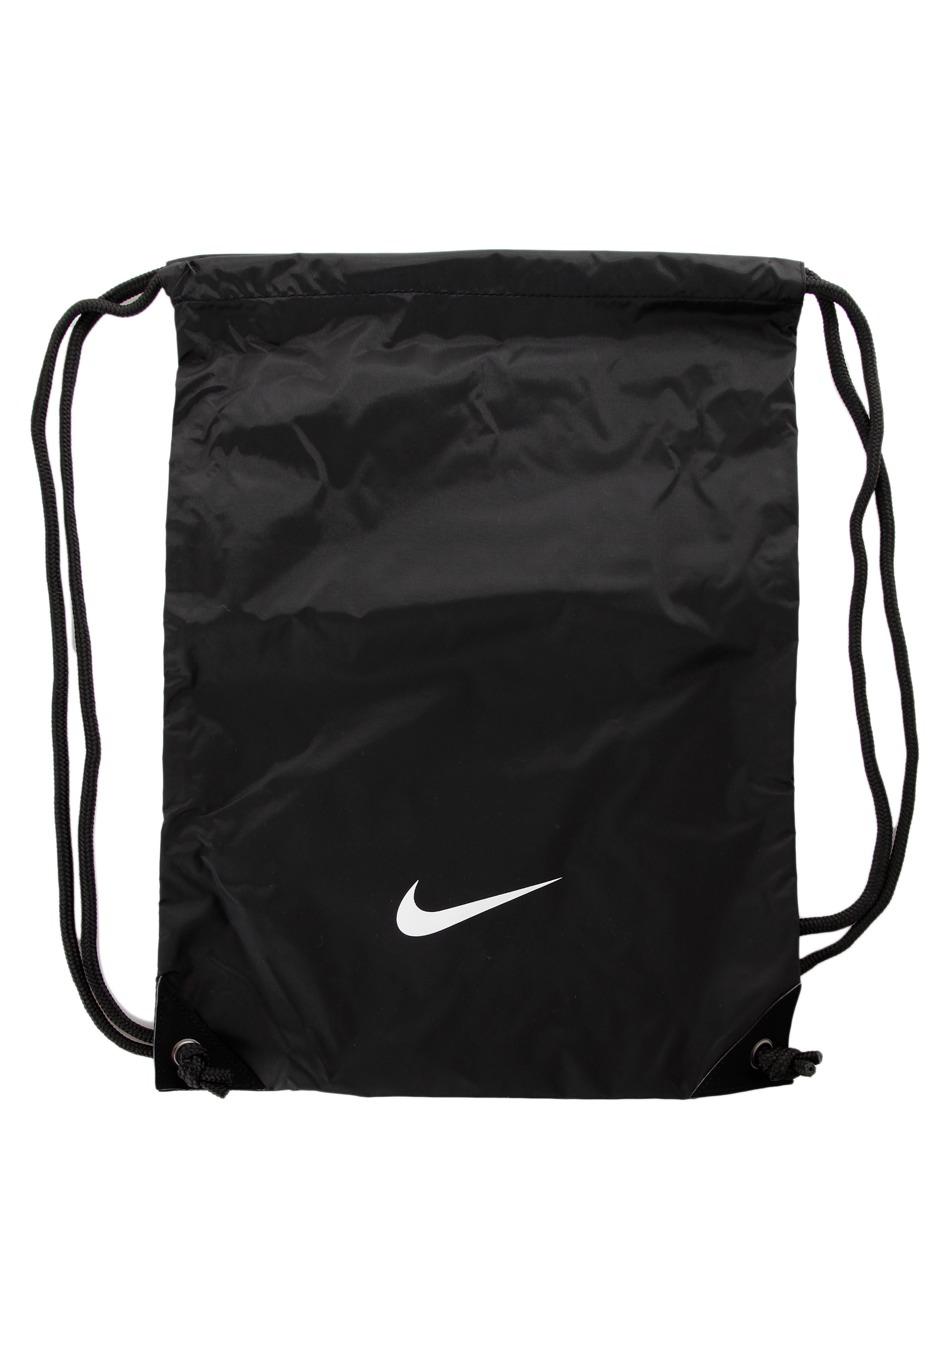 1e870f2a6e Nike - Fundamentals Swoosh Gymsack Black Black White - Backpack -  Streetwear Shop - Impericon.com UK